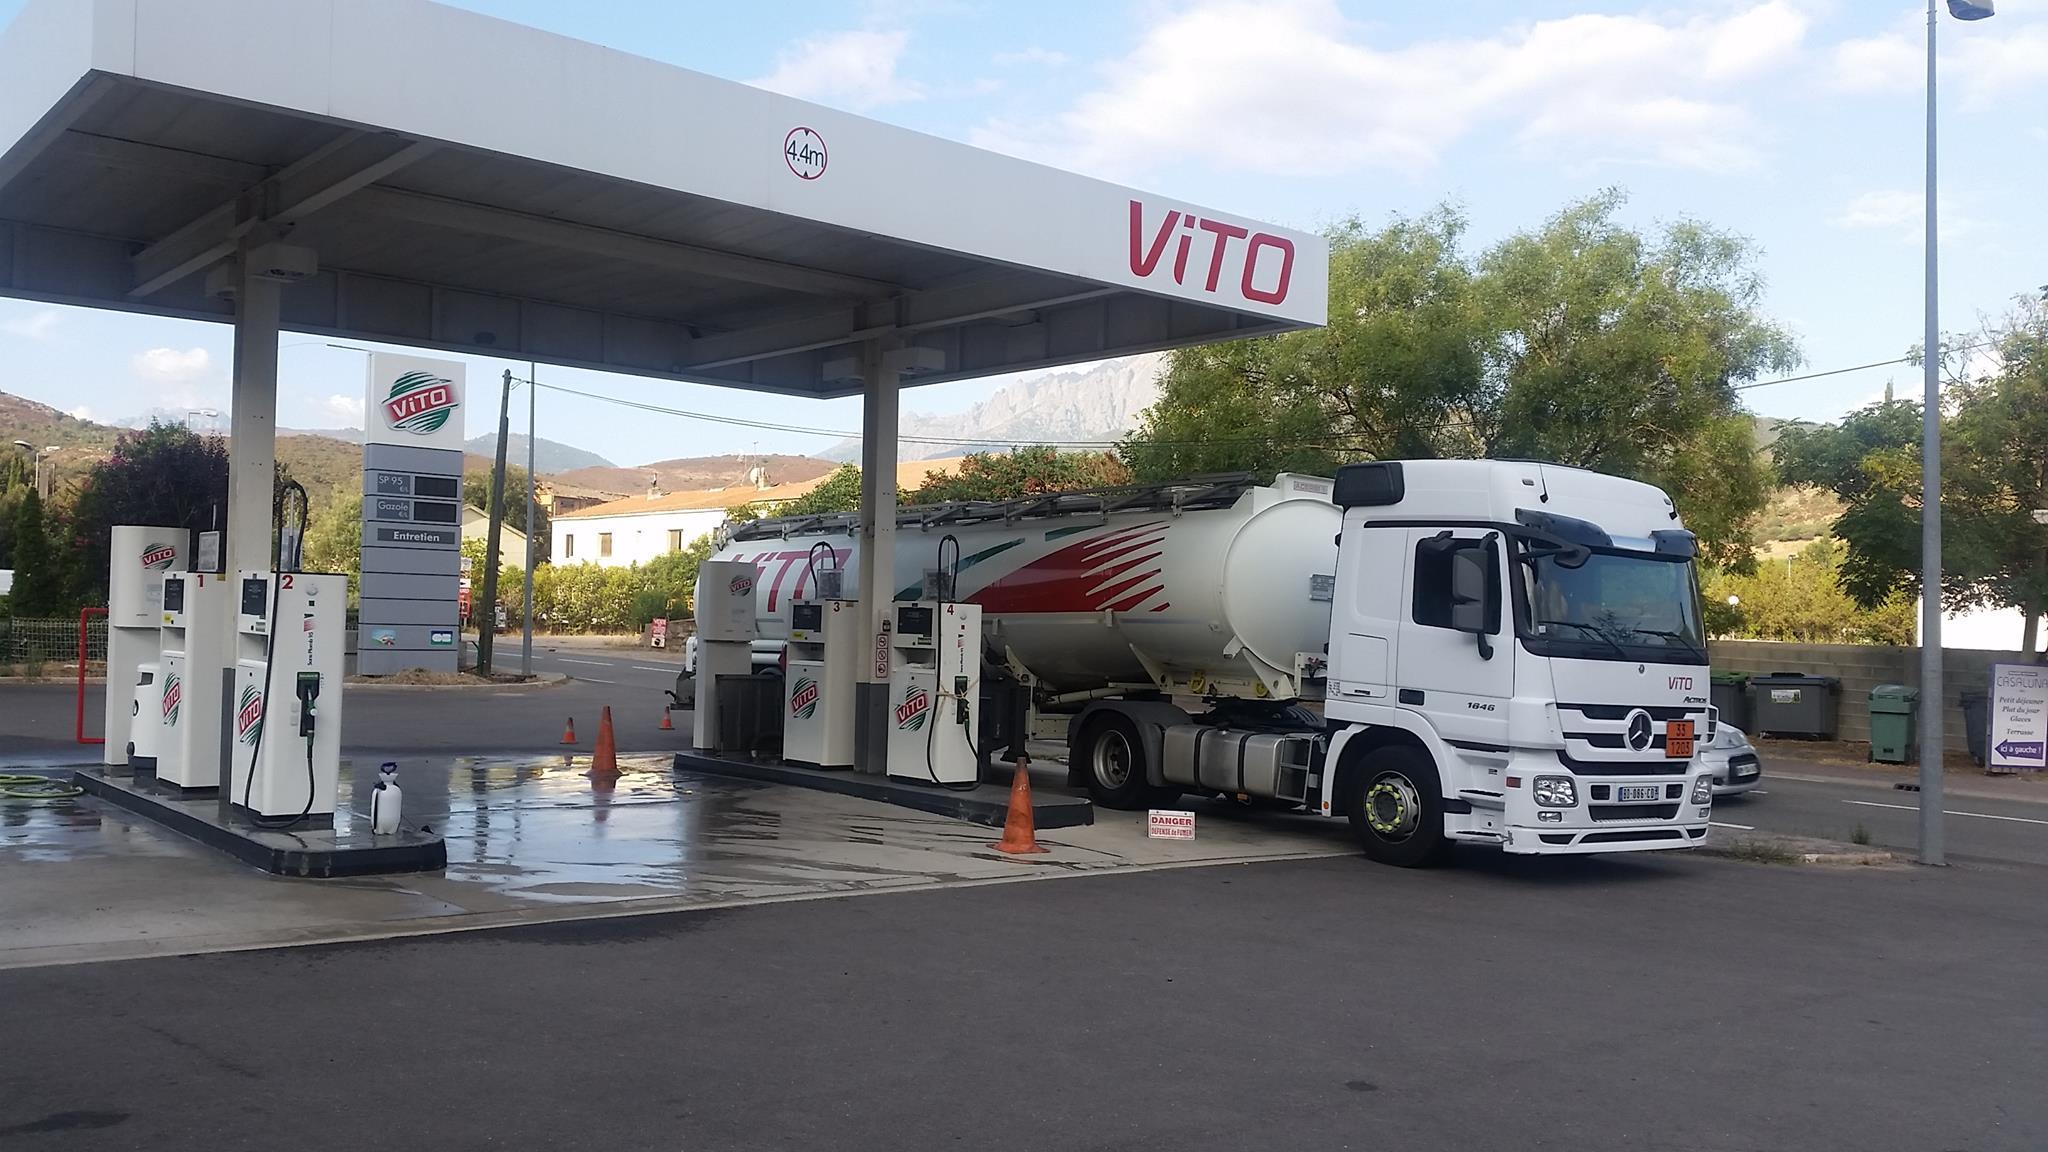 Station Vito Ponte-Leccia Antoniotti Serge